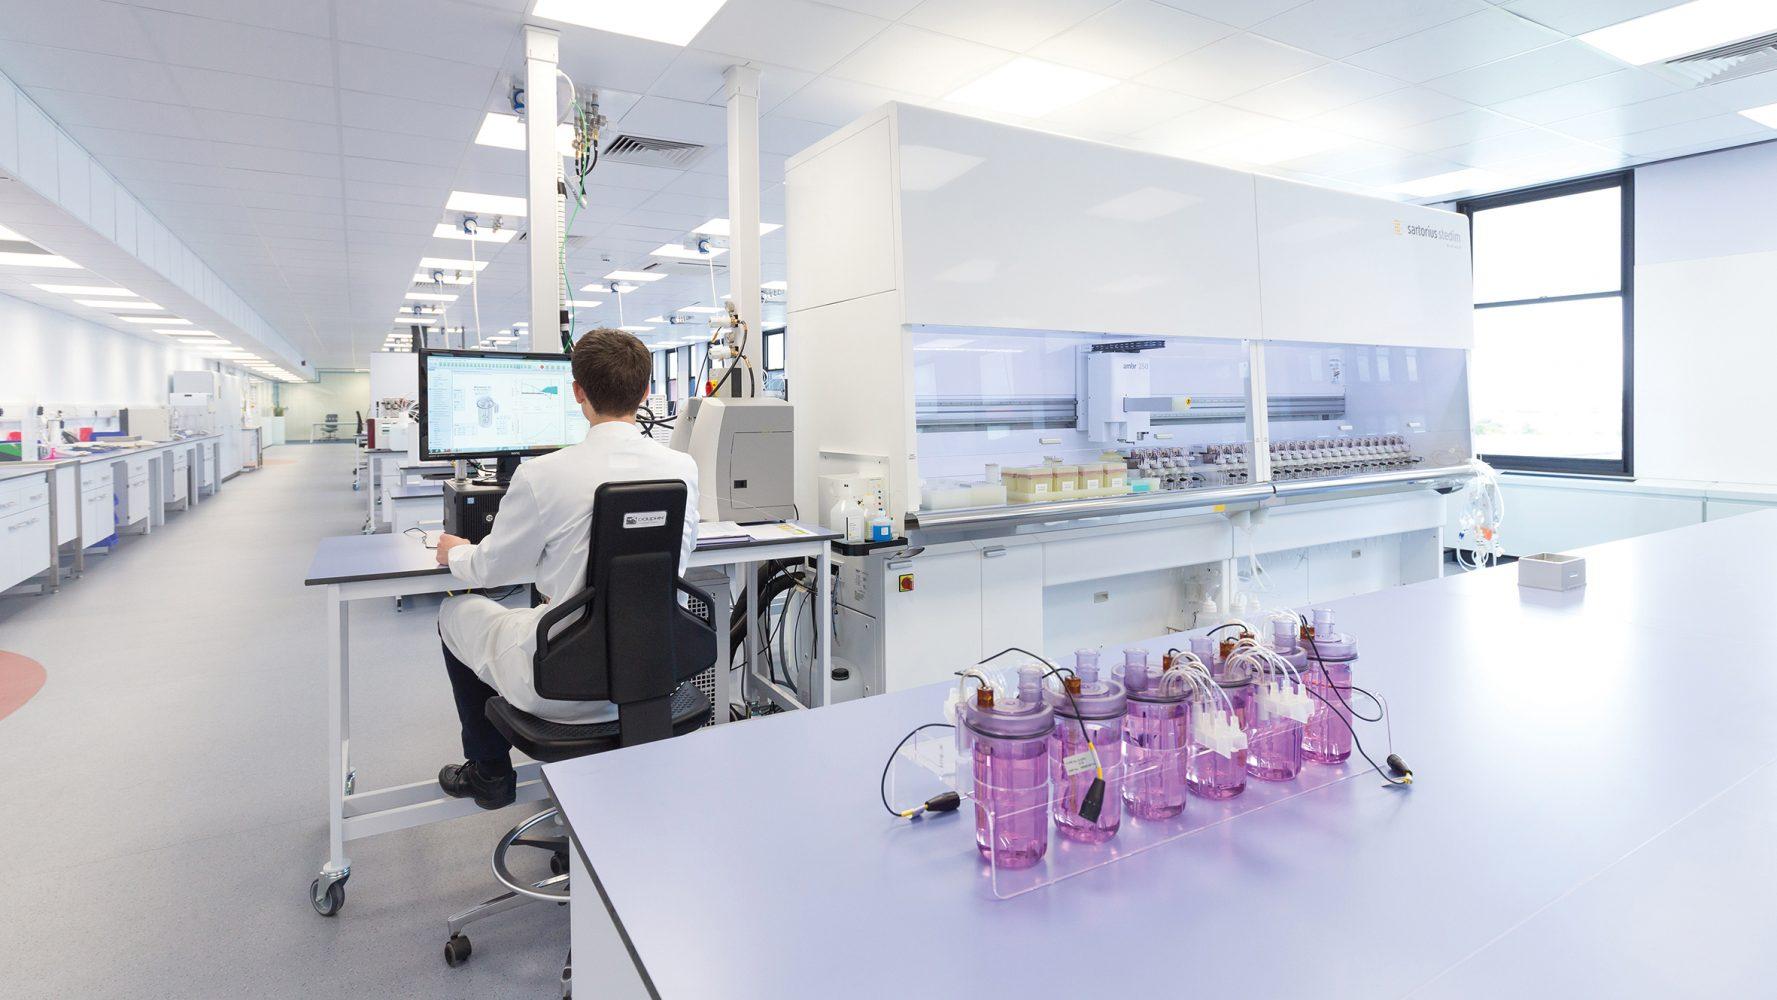 FUJIFILM Diosynth Biotechnologies Case Study - First Step